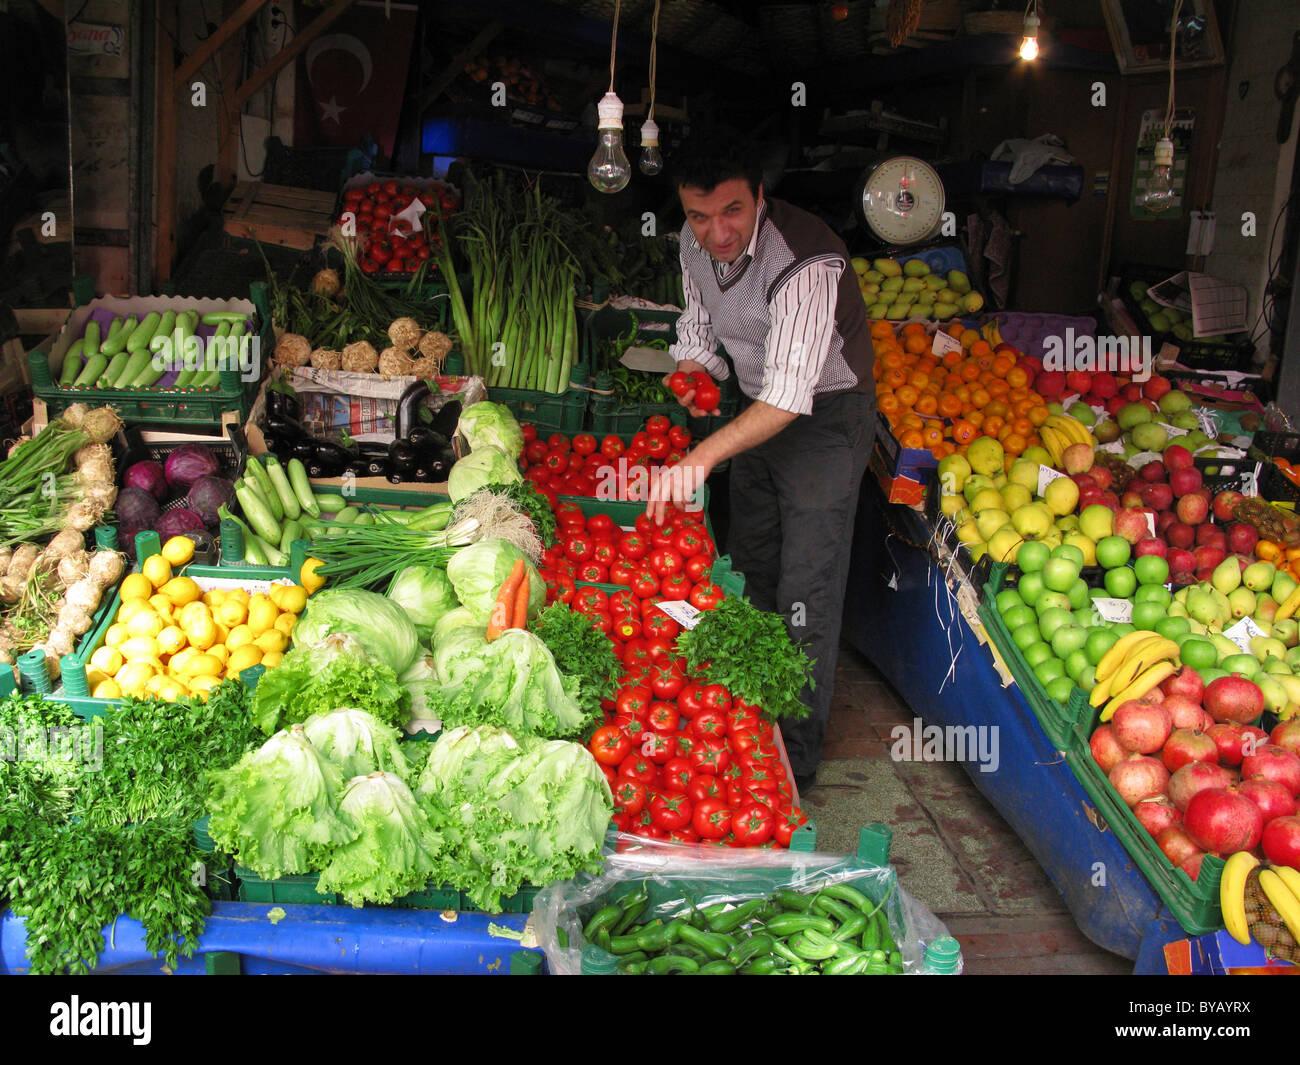 Greengrocers Shop, Princes Island of Buyukada, near Istanbul, Turkey - Stock Image